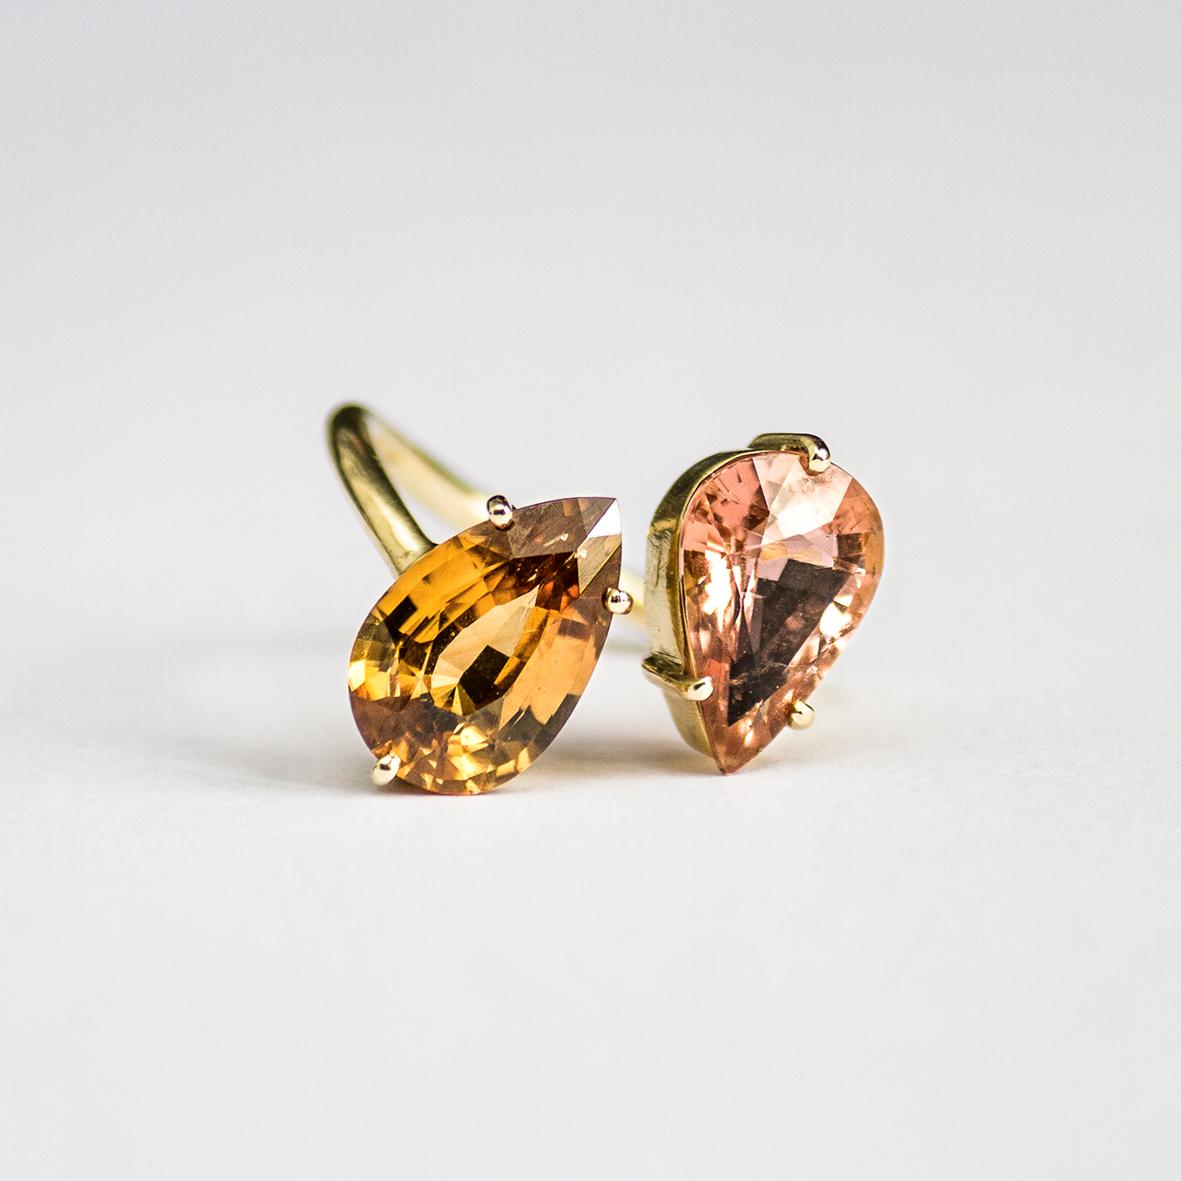 4. OONA_gems of ceylon_ficha1_tourmaline and zircon ring